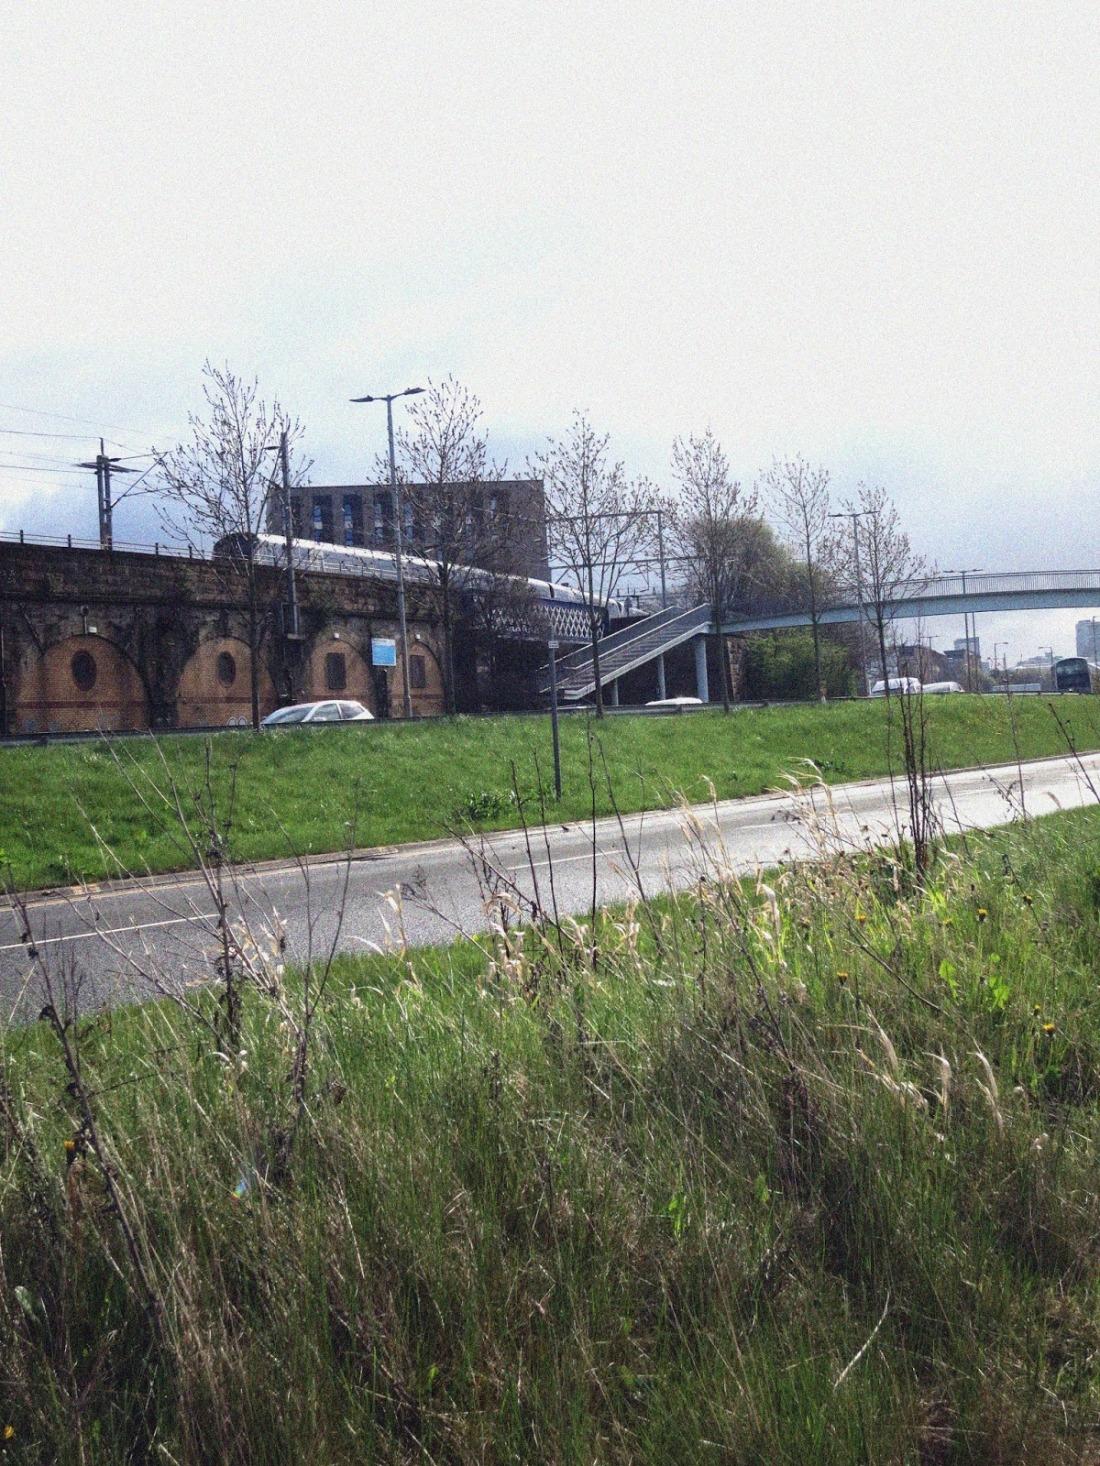 urban scene with railway